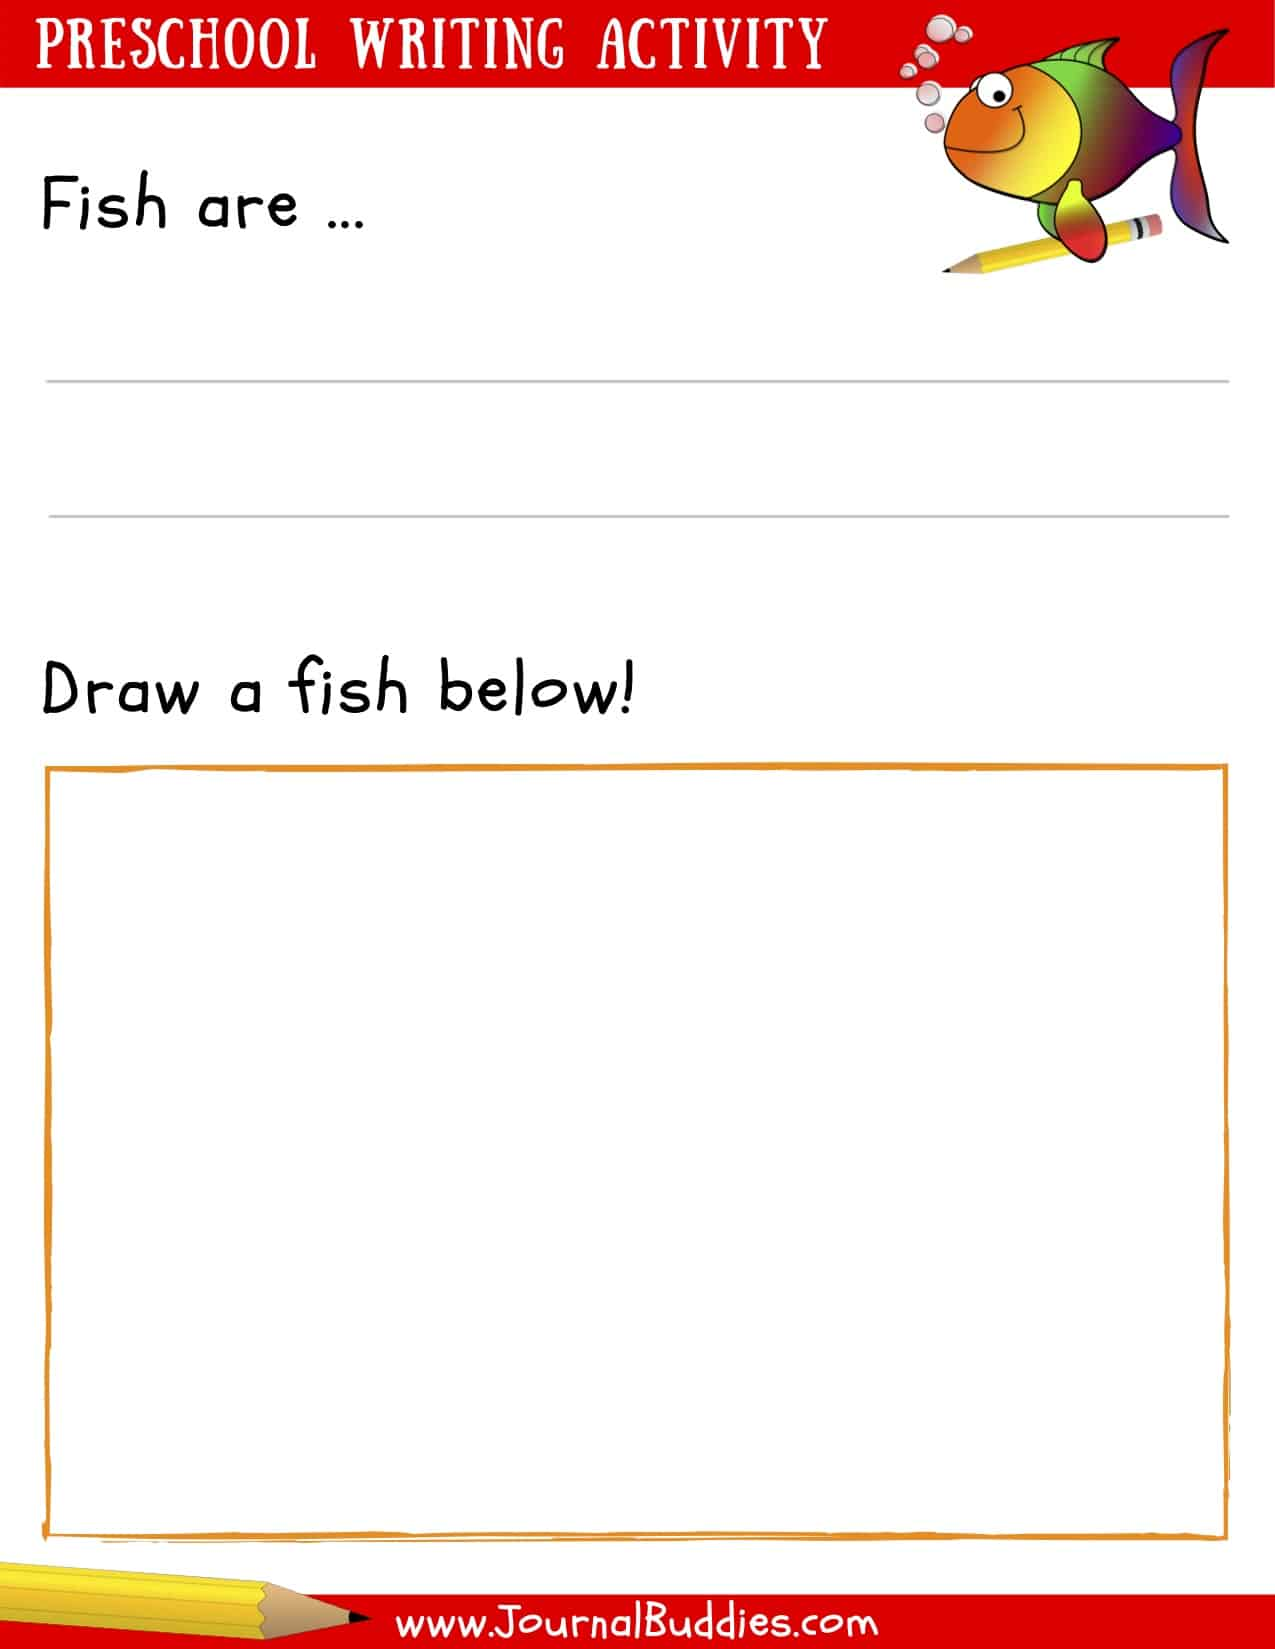 PreSchool Writing Activity printable sheet